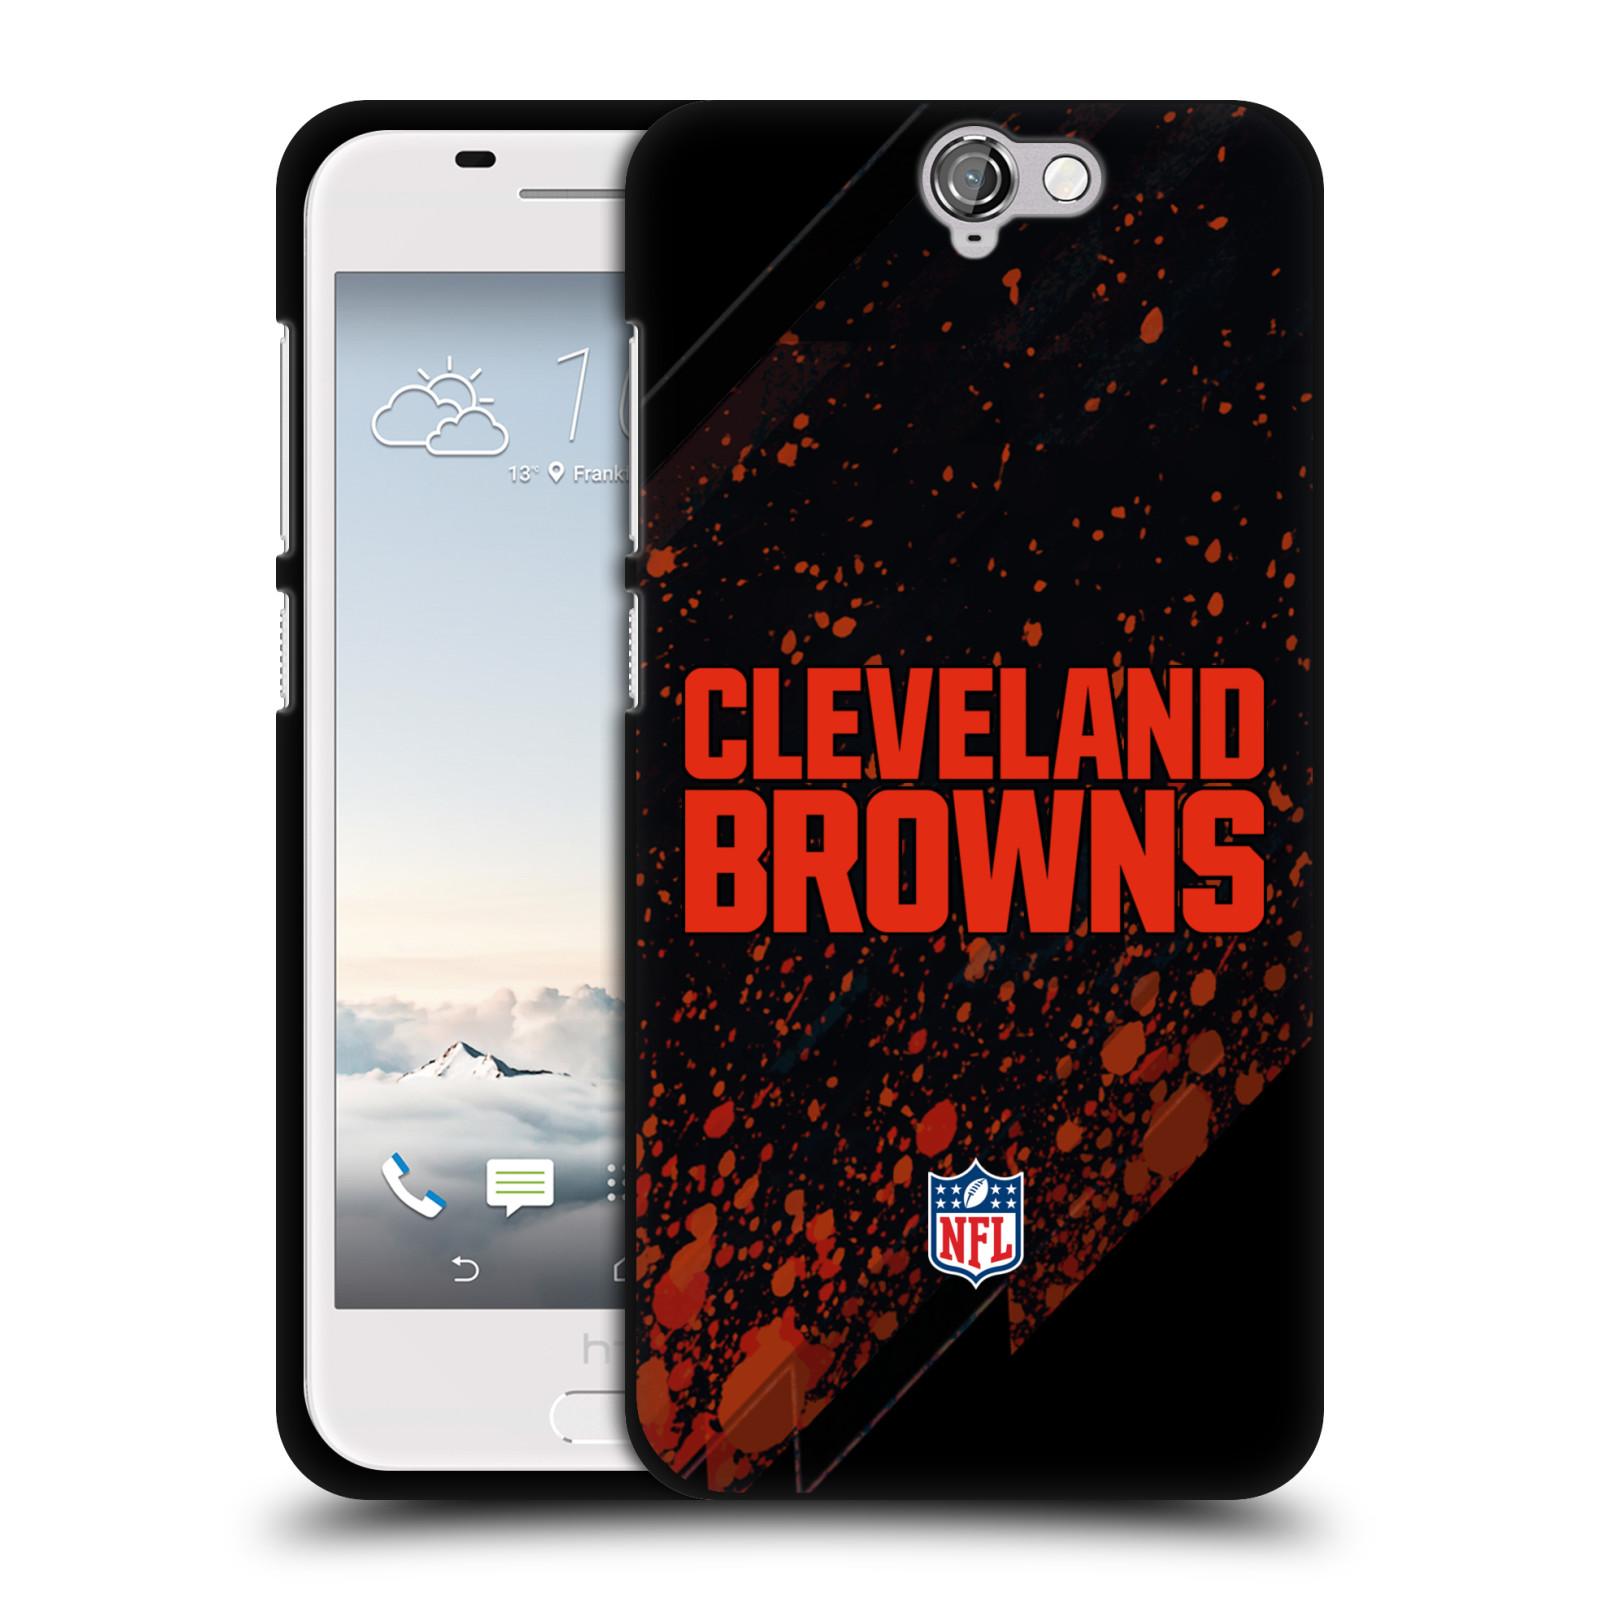 OFFIZIELLE-NFL-CLEVELAND-BROWNS-LOGO-SOFT-GEL-HULLE-SCHWARZ-FUR-HTC-HANDYS